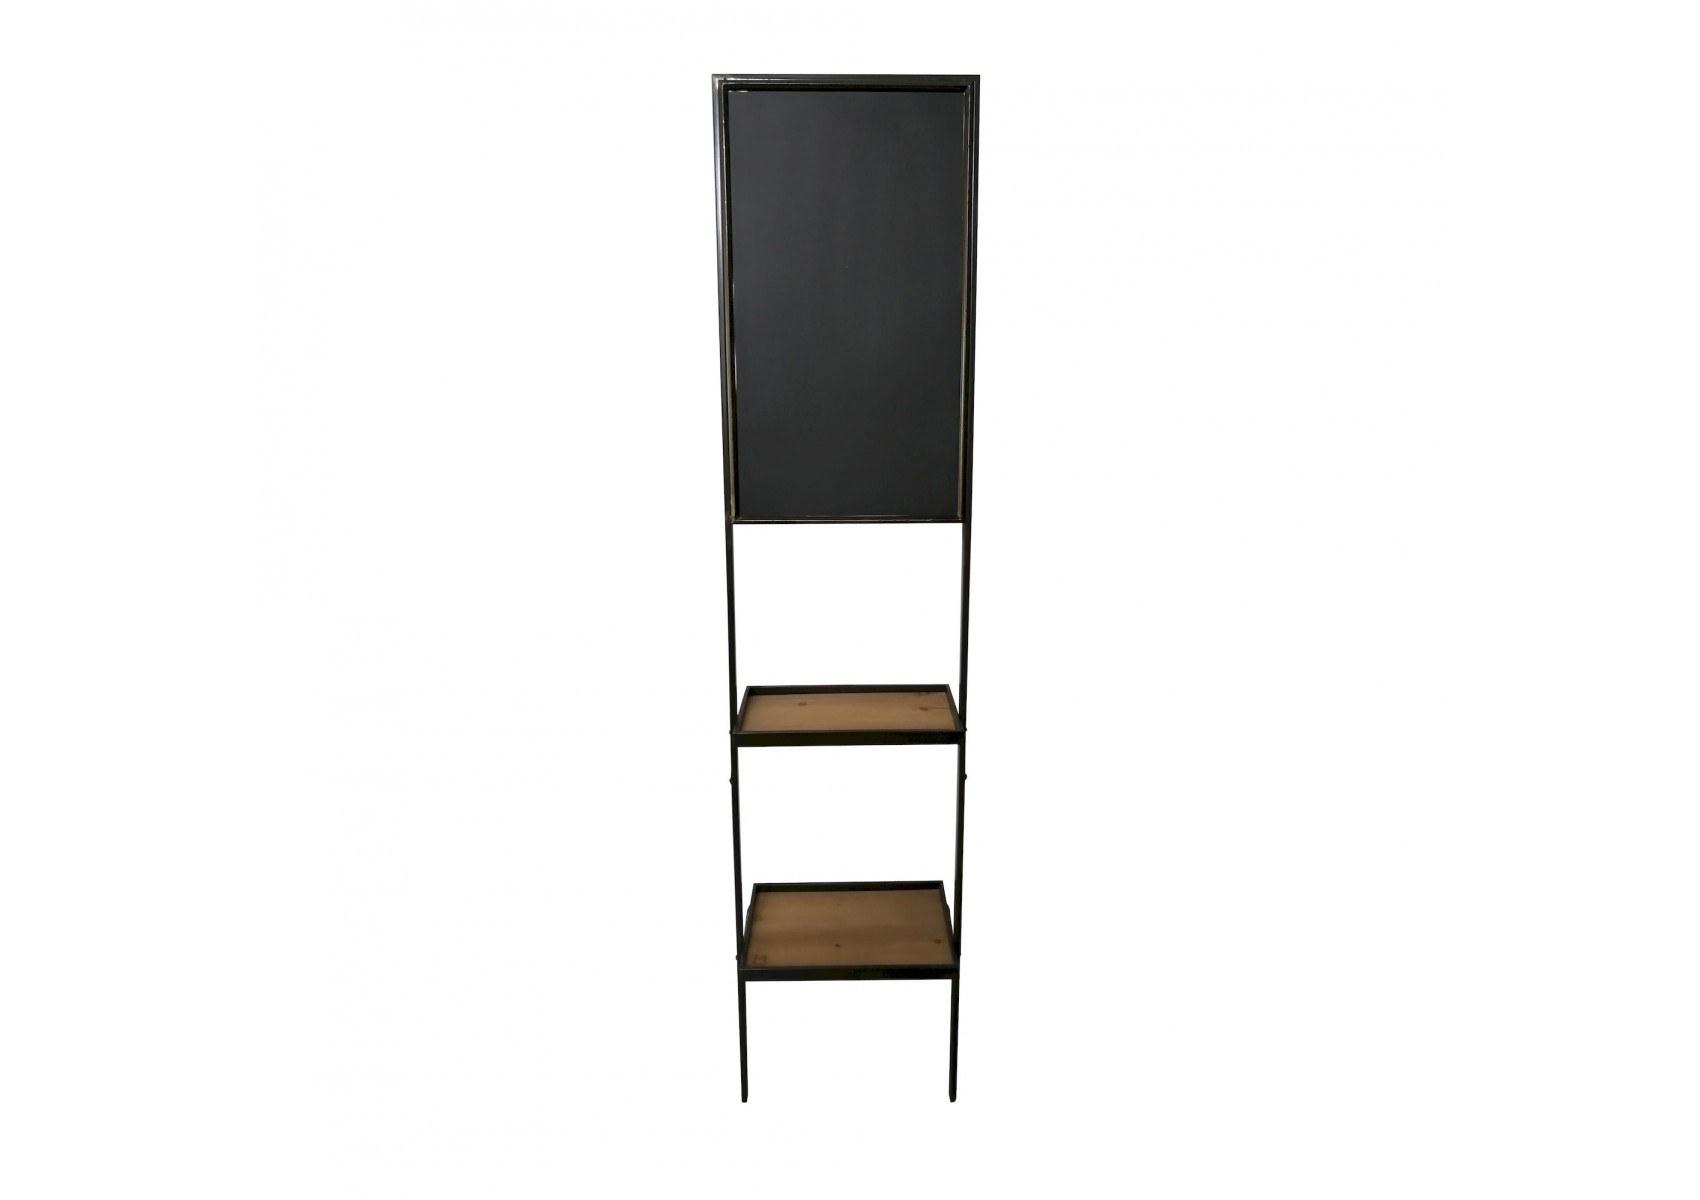 etag re industrielle avec tableau noir ladder redcartel. Black Bedroom Furniture Sets. Home Design Ideas